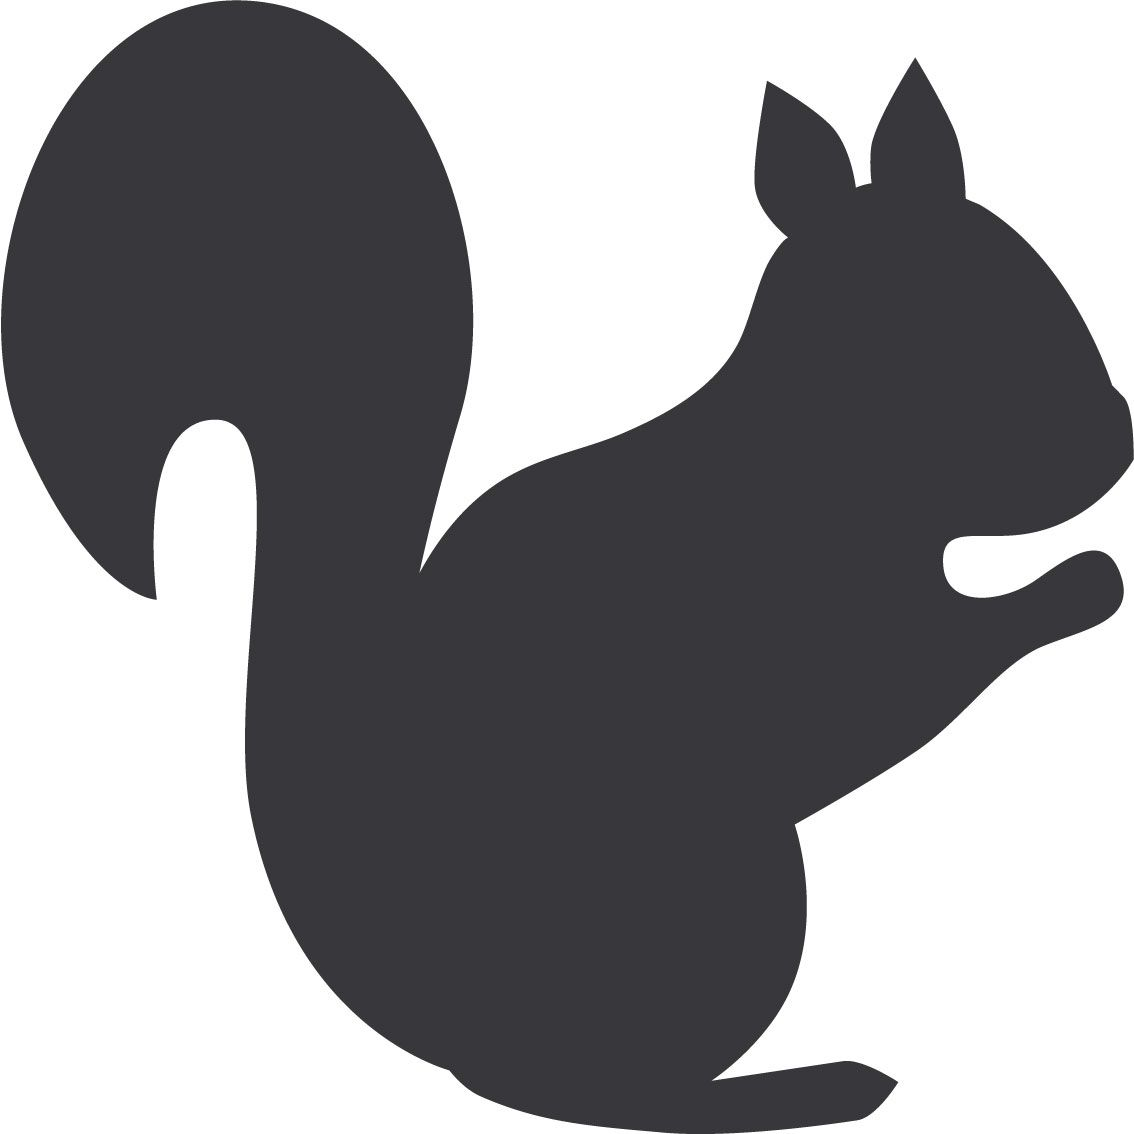 Dibujo De Ardilla With Images Squirrel Silhouette Animal Silhouette Squirrel